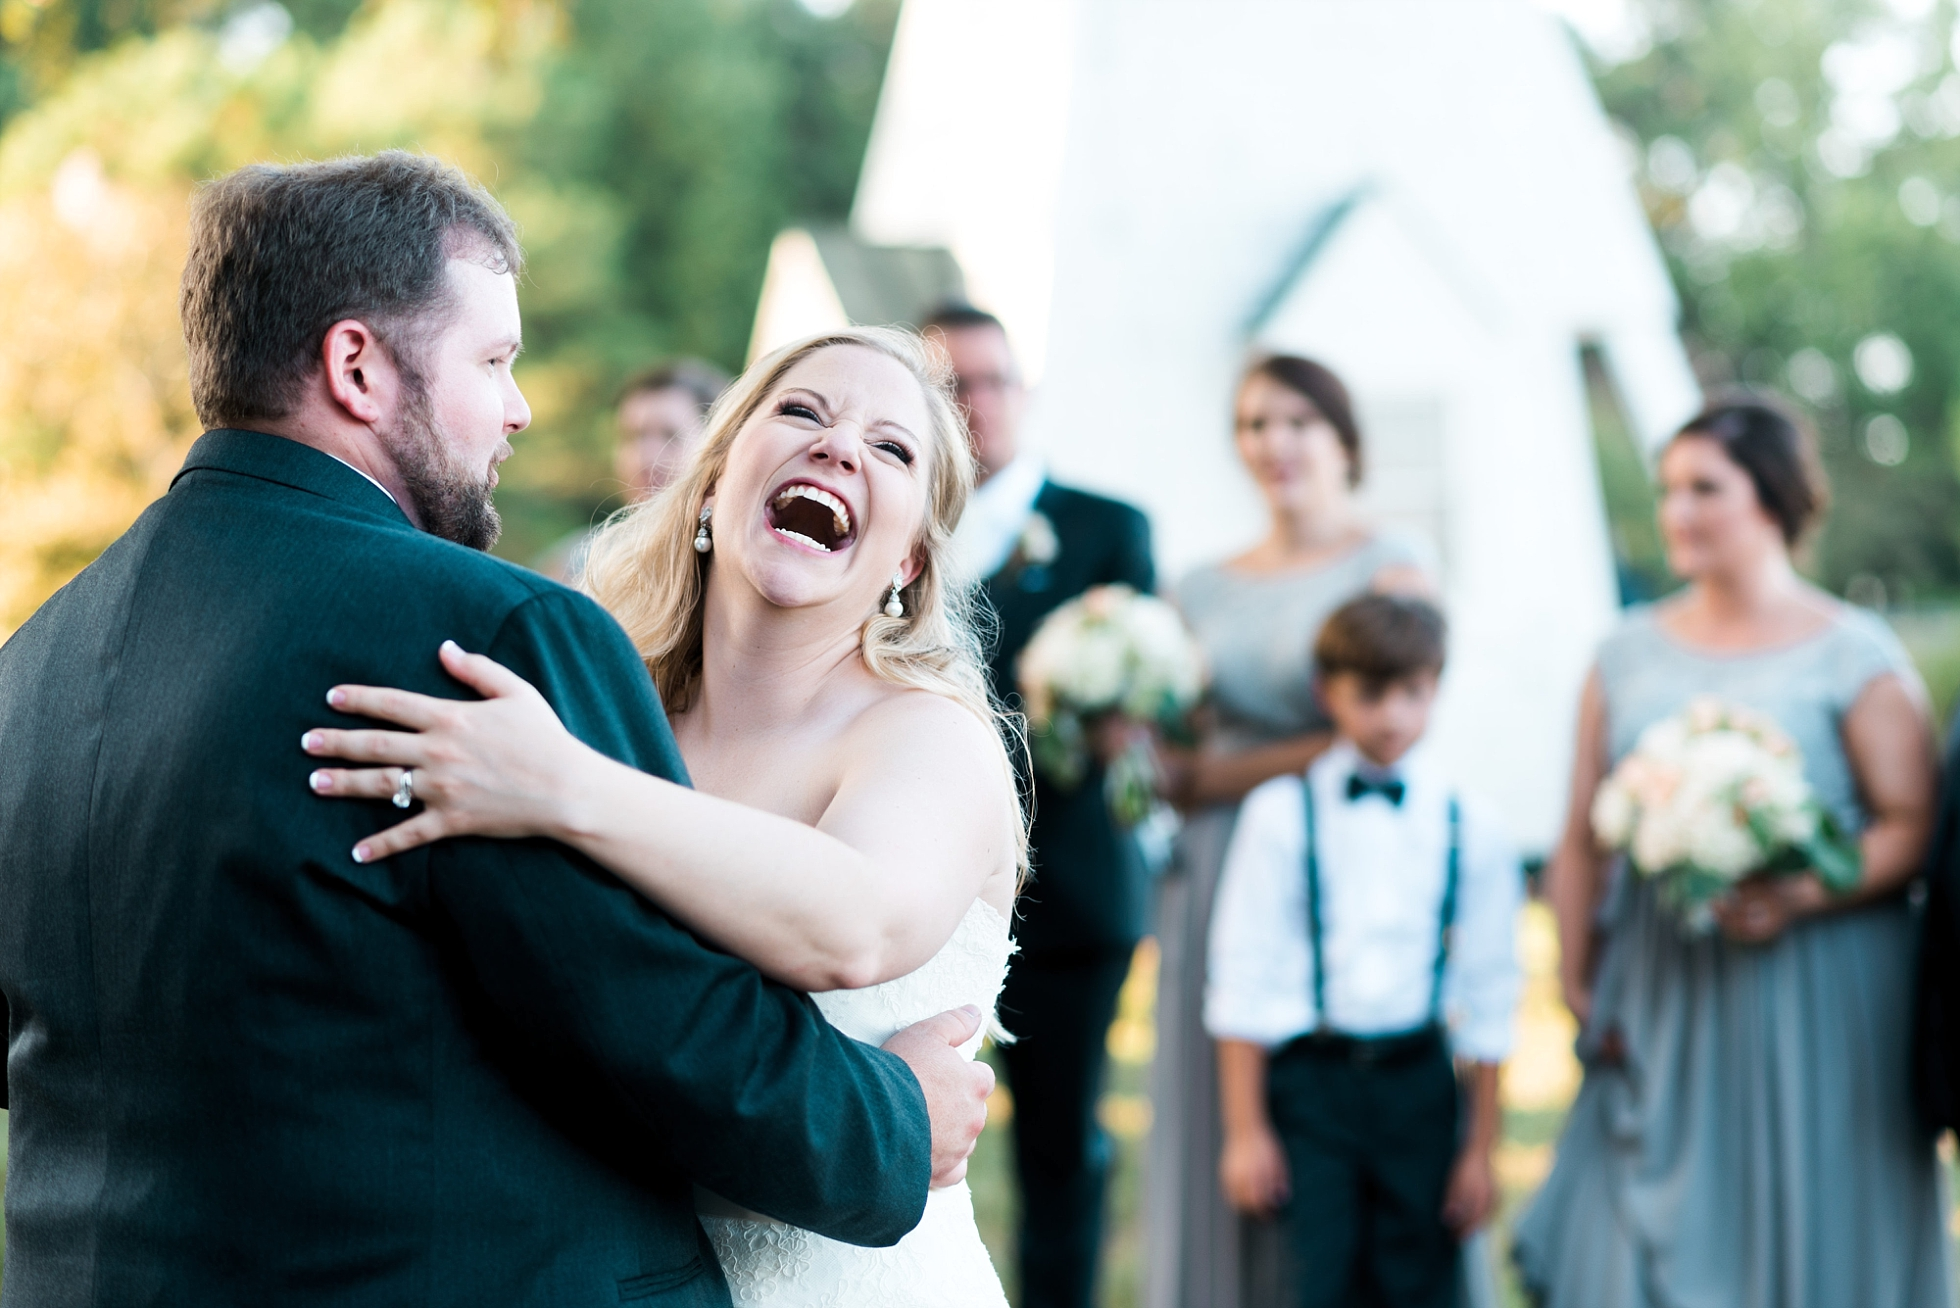 Reception | Kyle & Erin | Scarbrough Wedding | Children's Harbor | Laura Wilkerson Photography